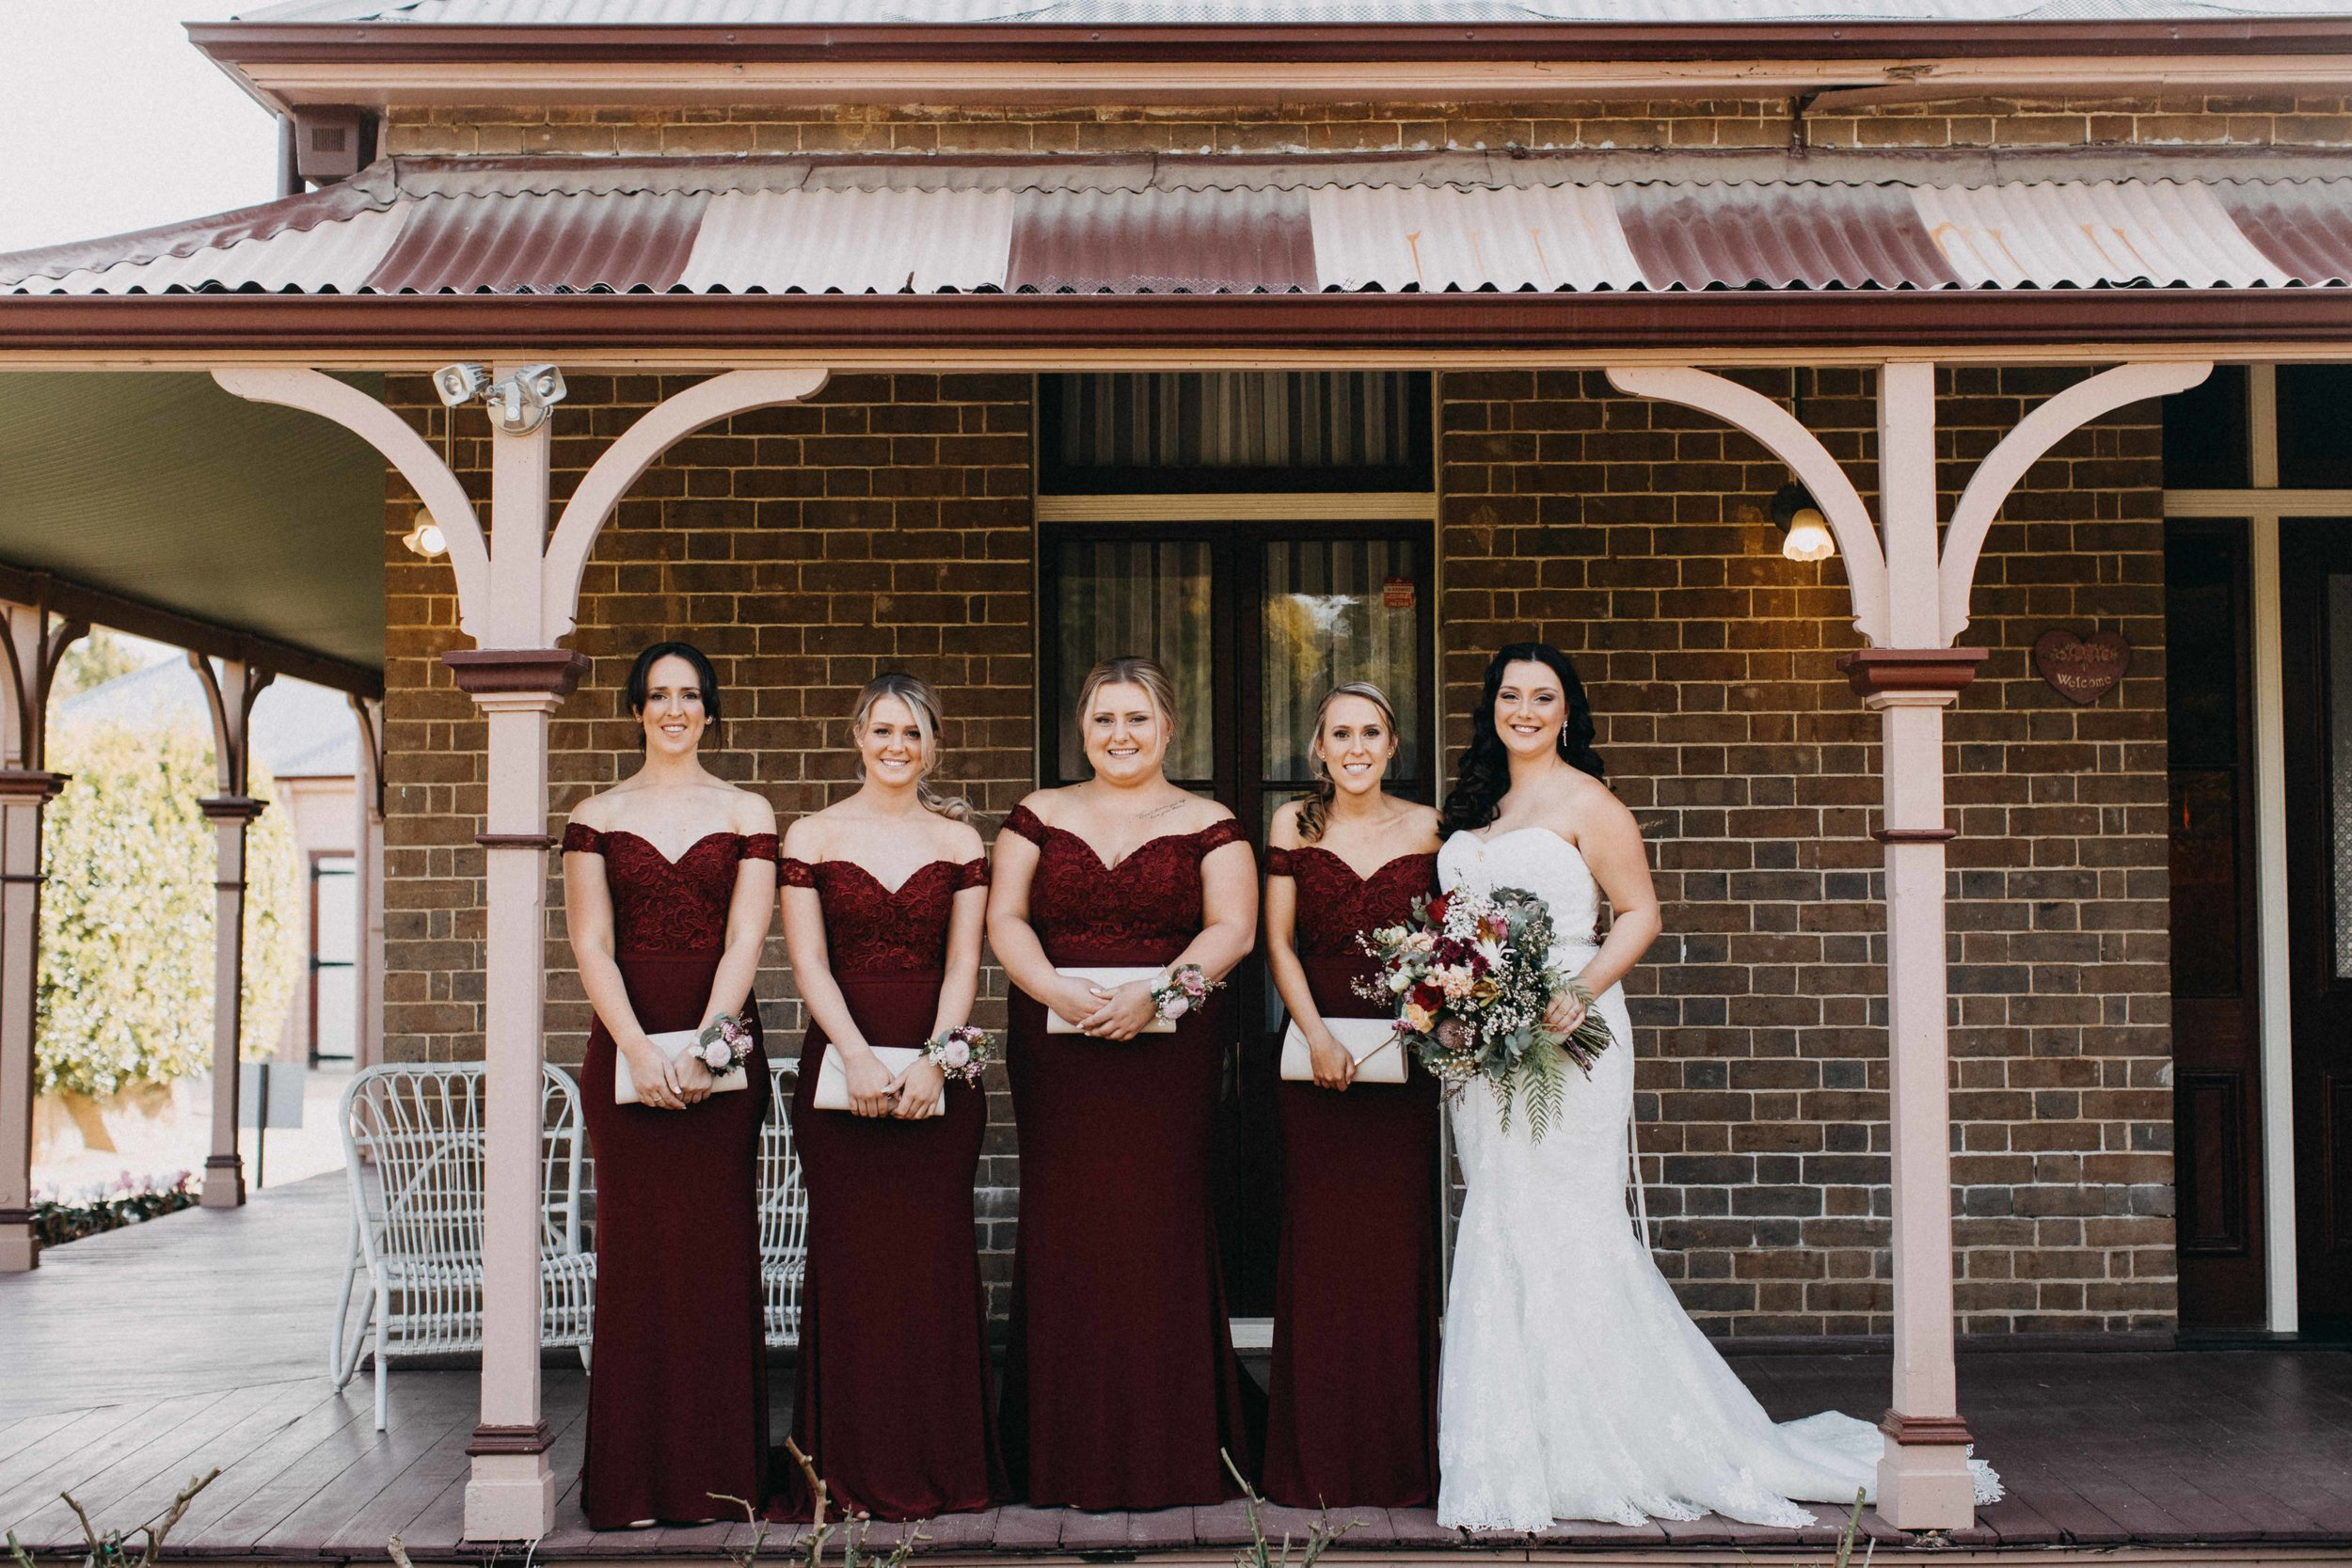 burnham-grove-camden-wedding-emilyobrienphotography-macarthur-48.jpg